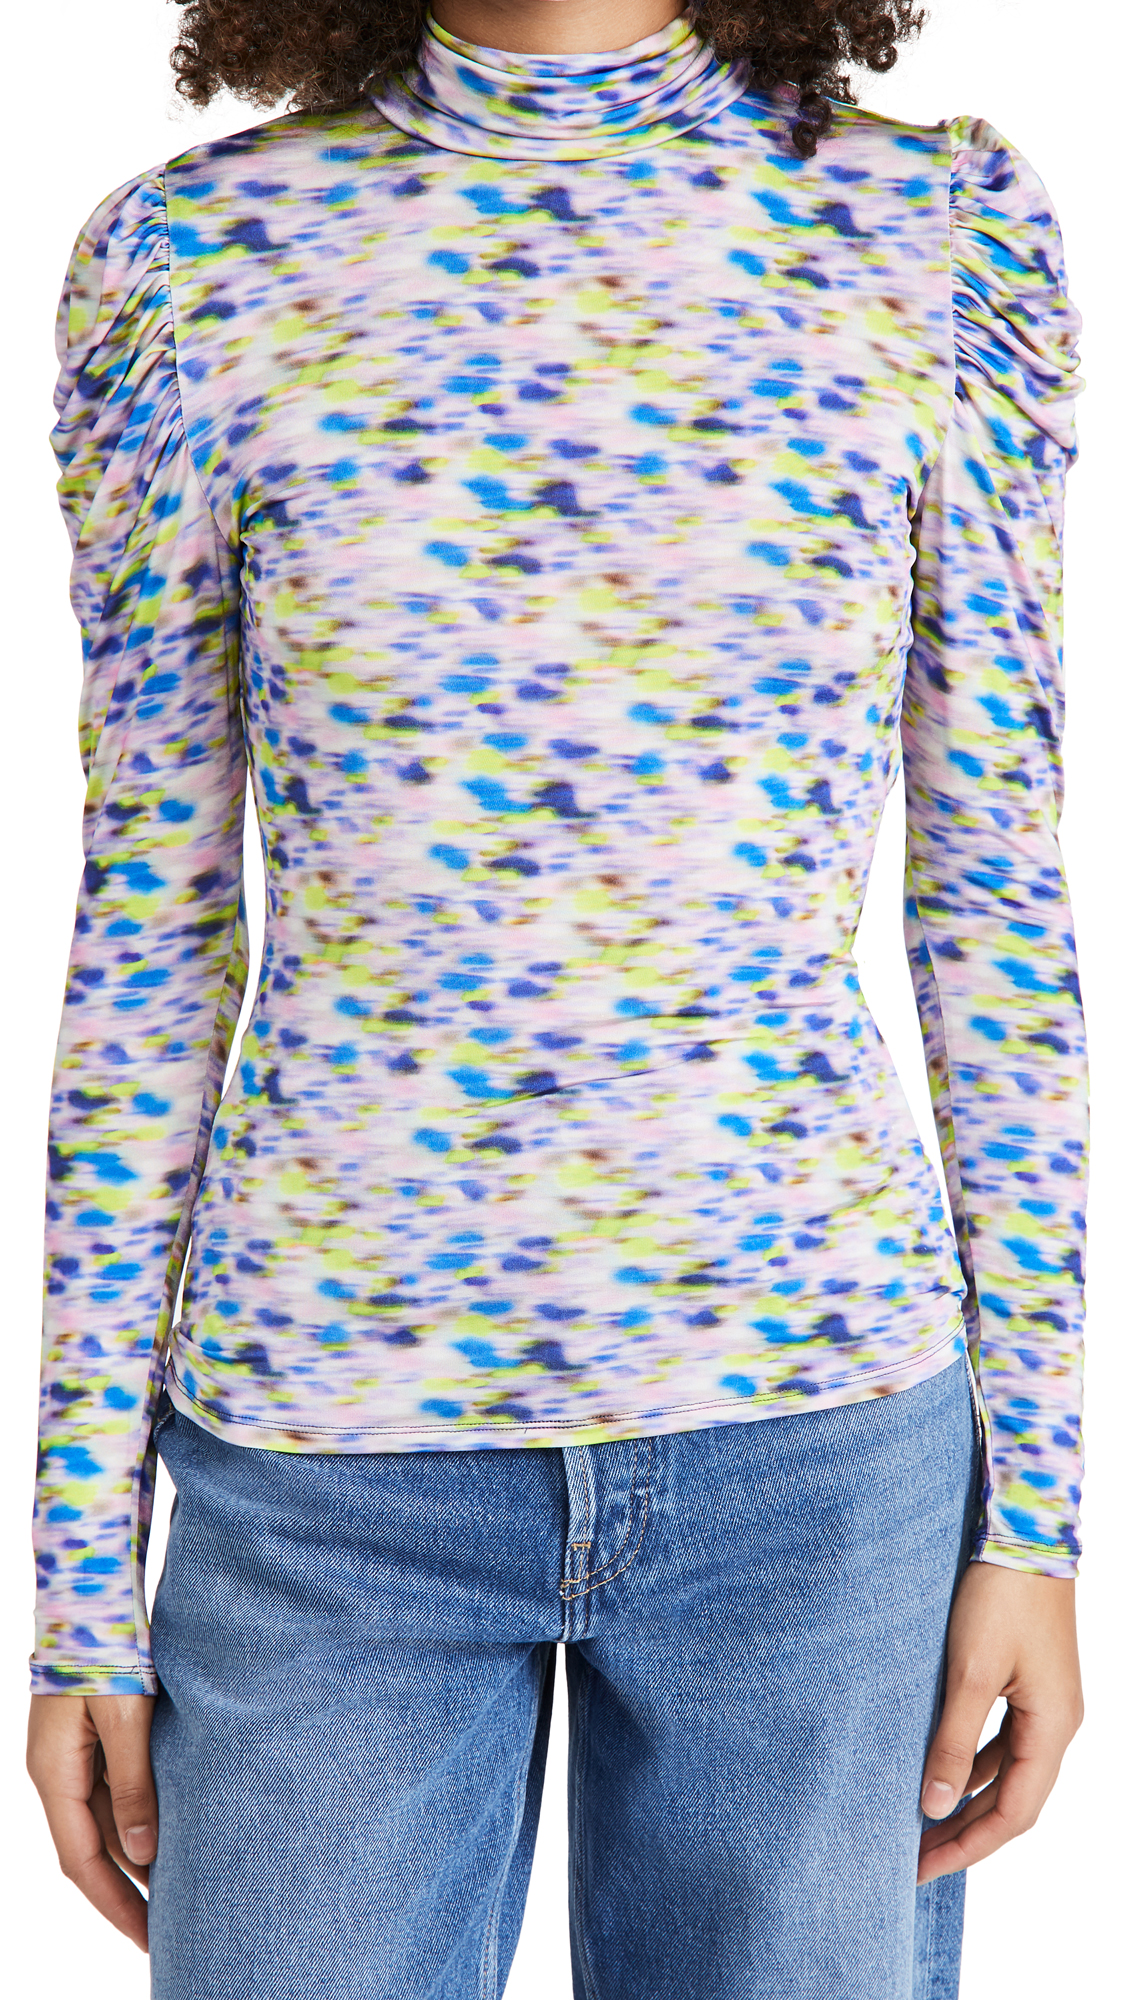 Tanya Taylor Women's Adonica Long-sleeve Turtleneck Printed Top In Baja Blue Haze Blue Multi